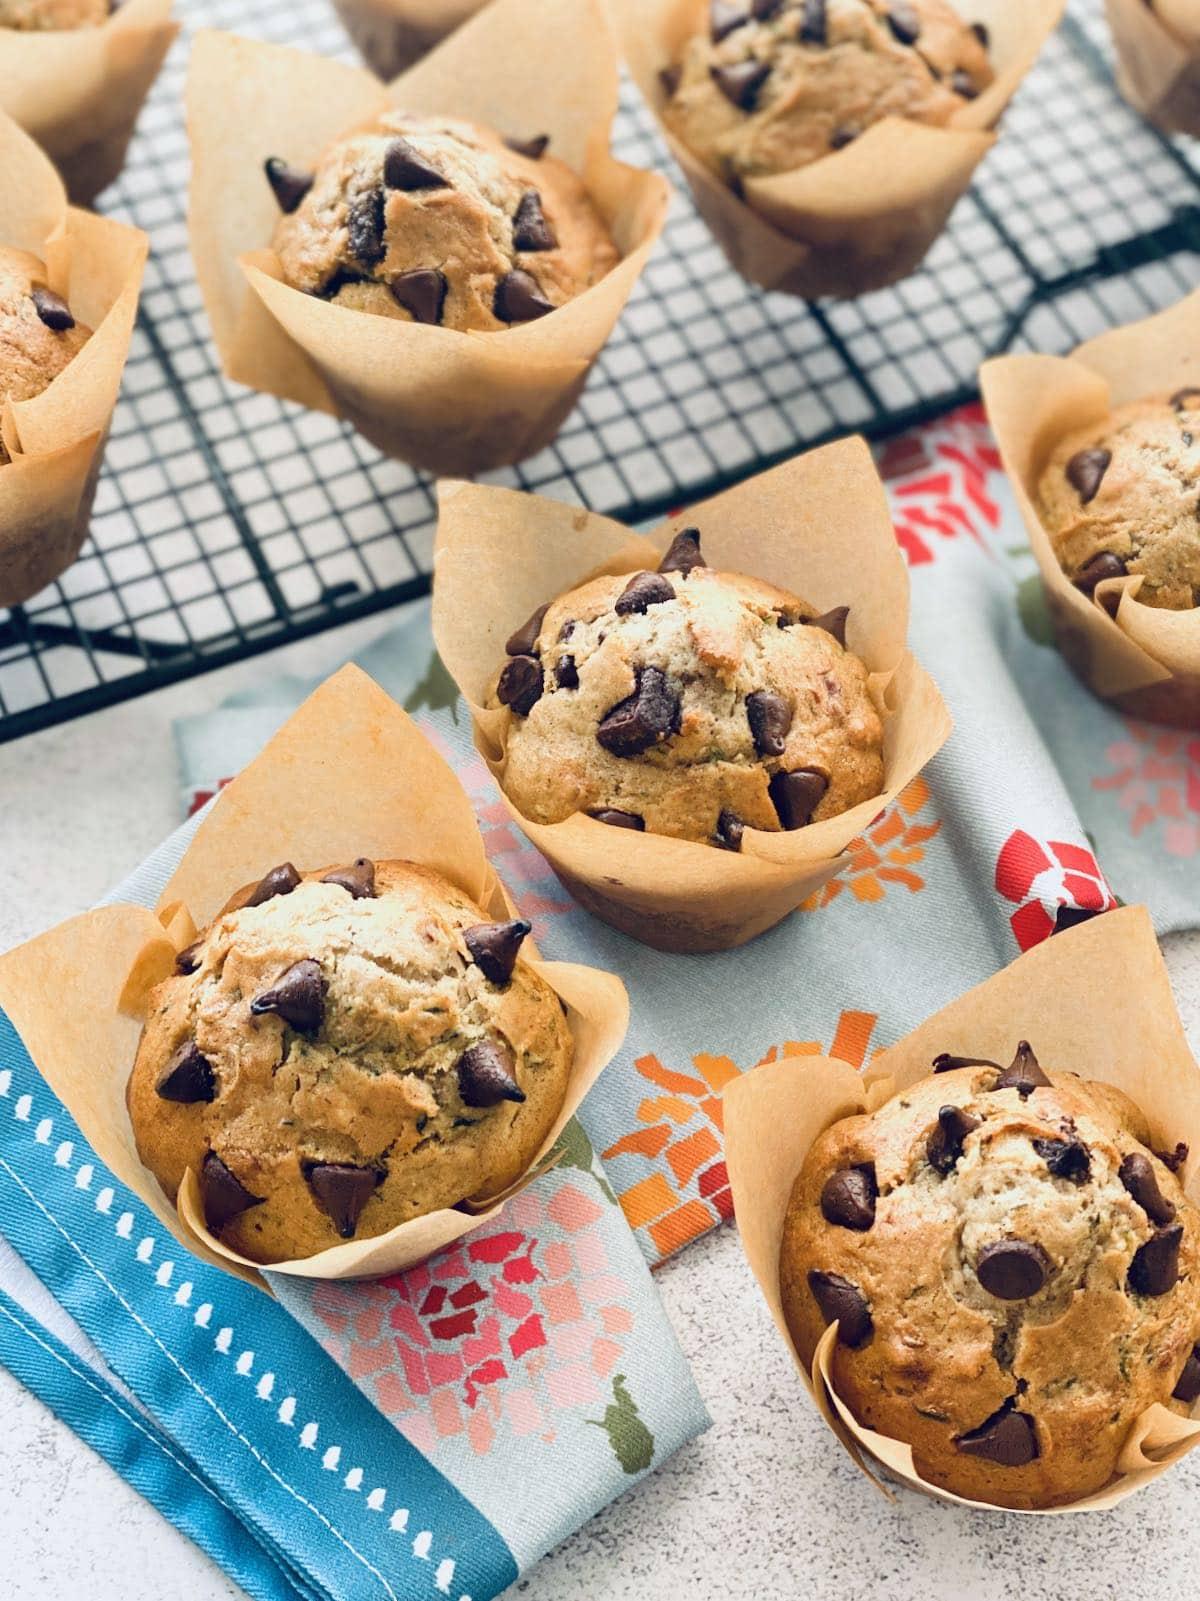 zucchini chocolate chip muffins on a baking rack.